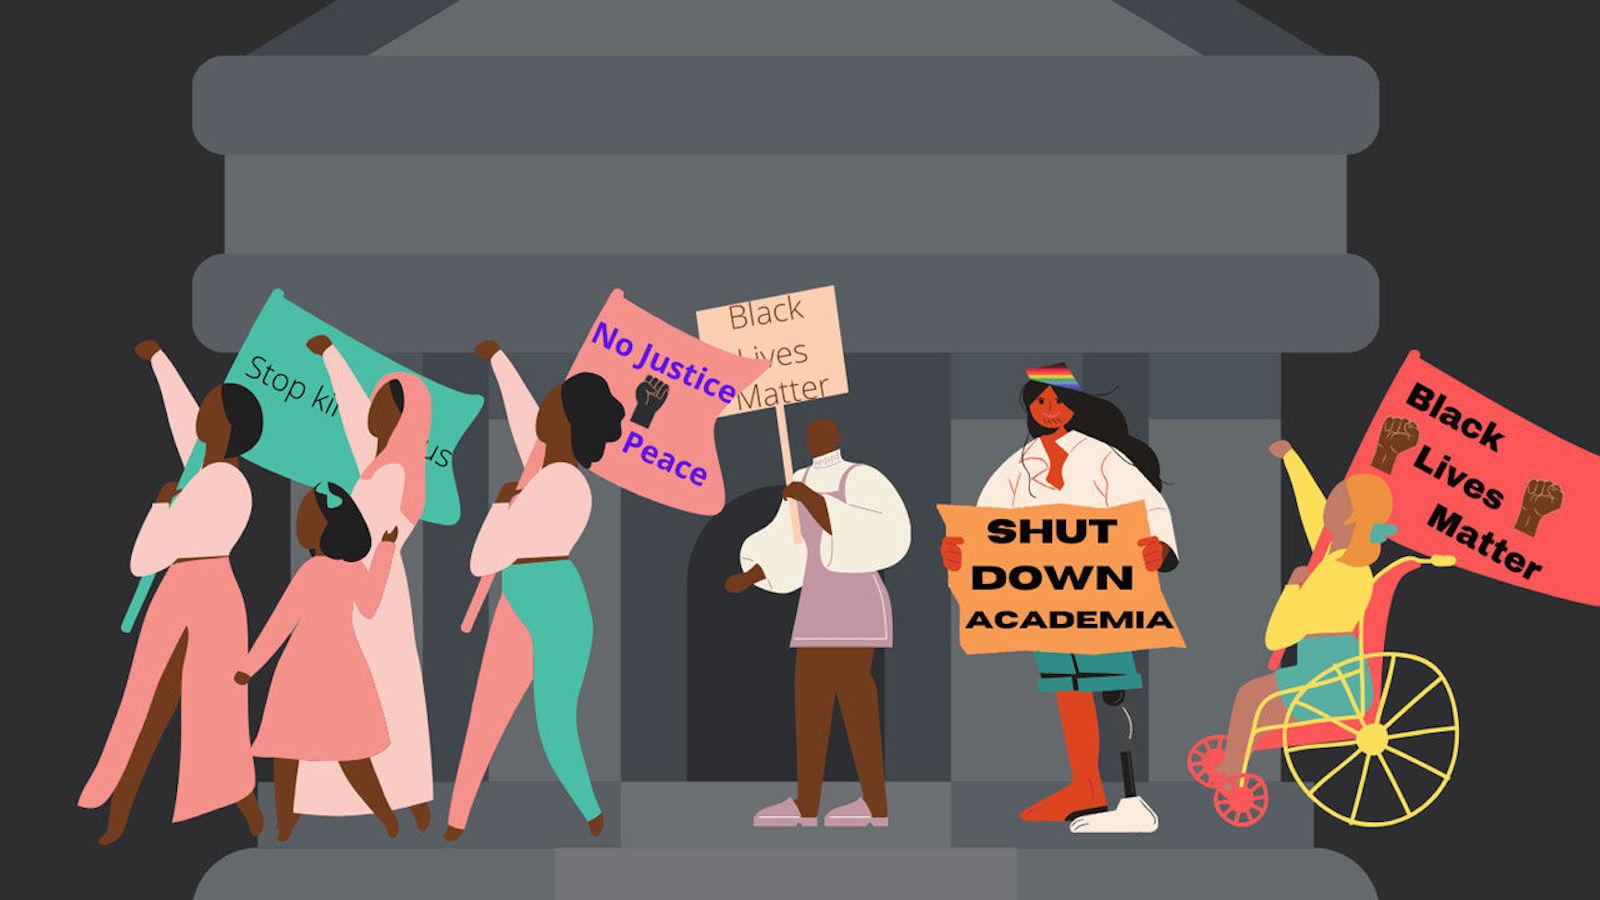 #ShutDownAcademia Graphic